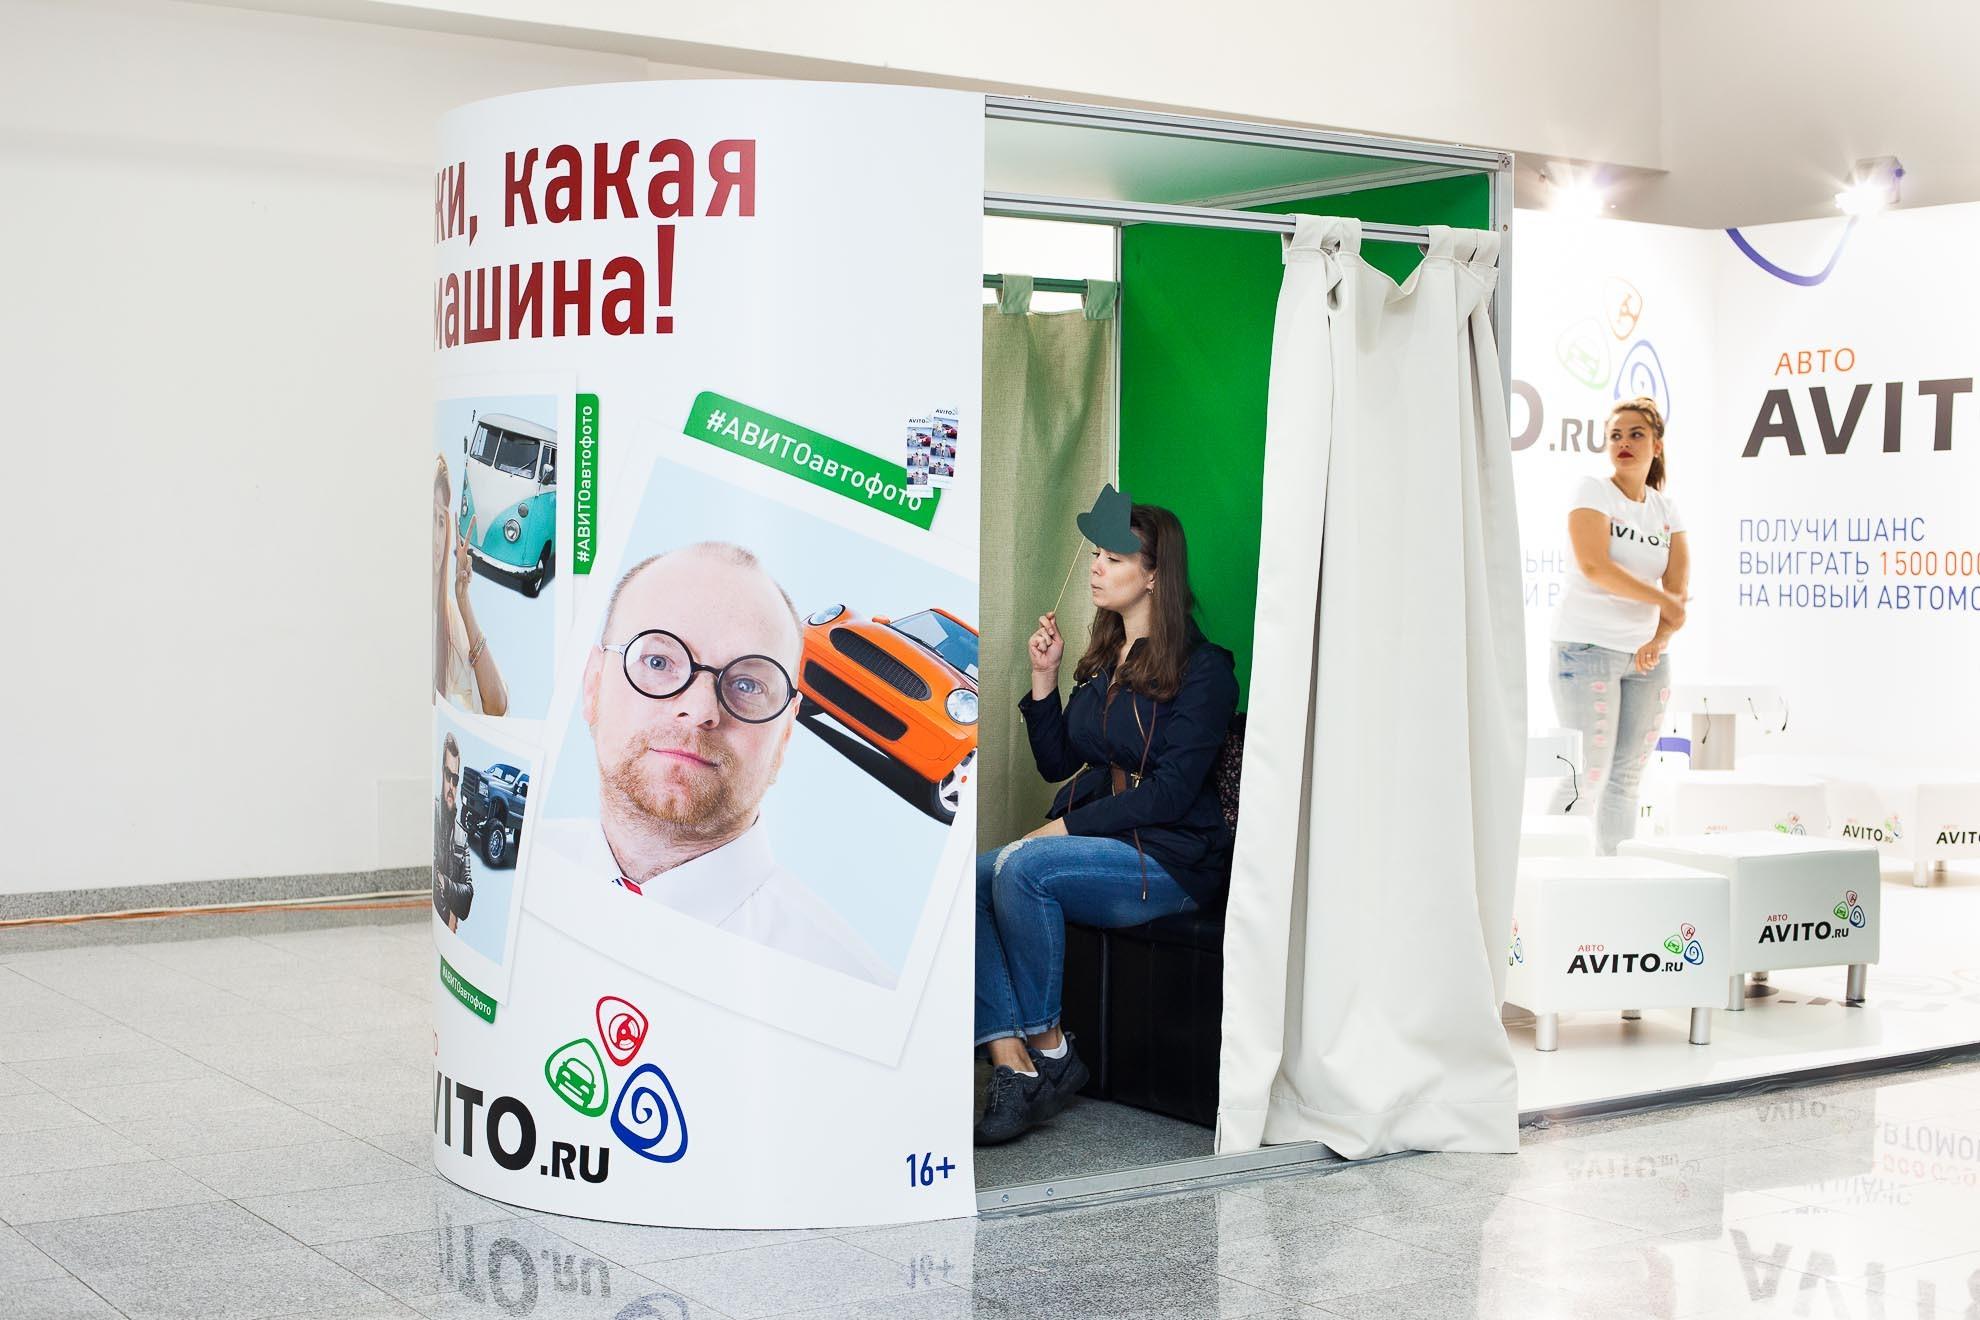 ММАС 2014 ДЛЯ AVITO Крокус Сити, с 27 августа по 7 сентября, Москва